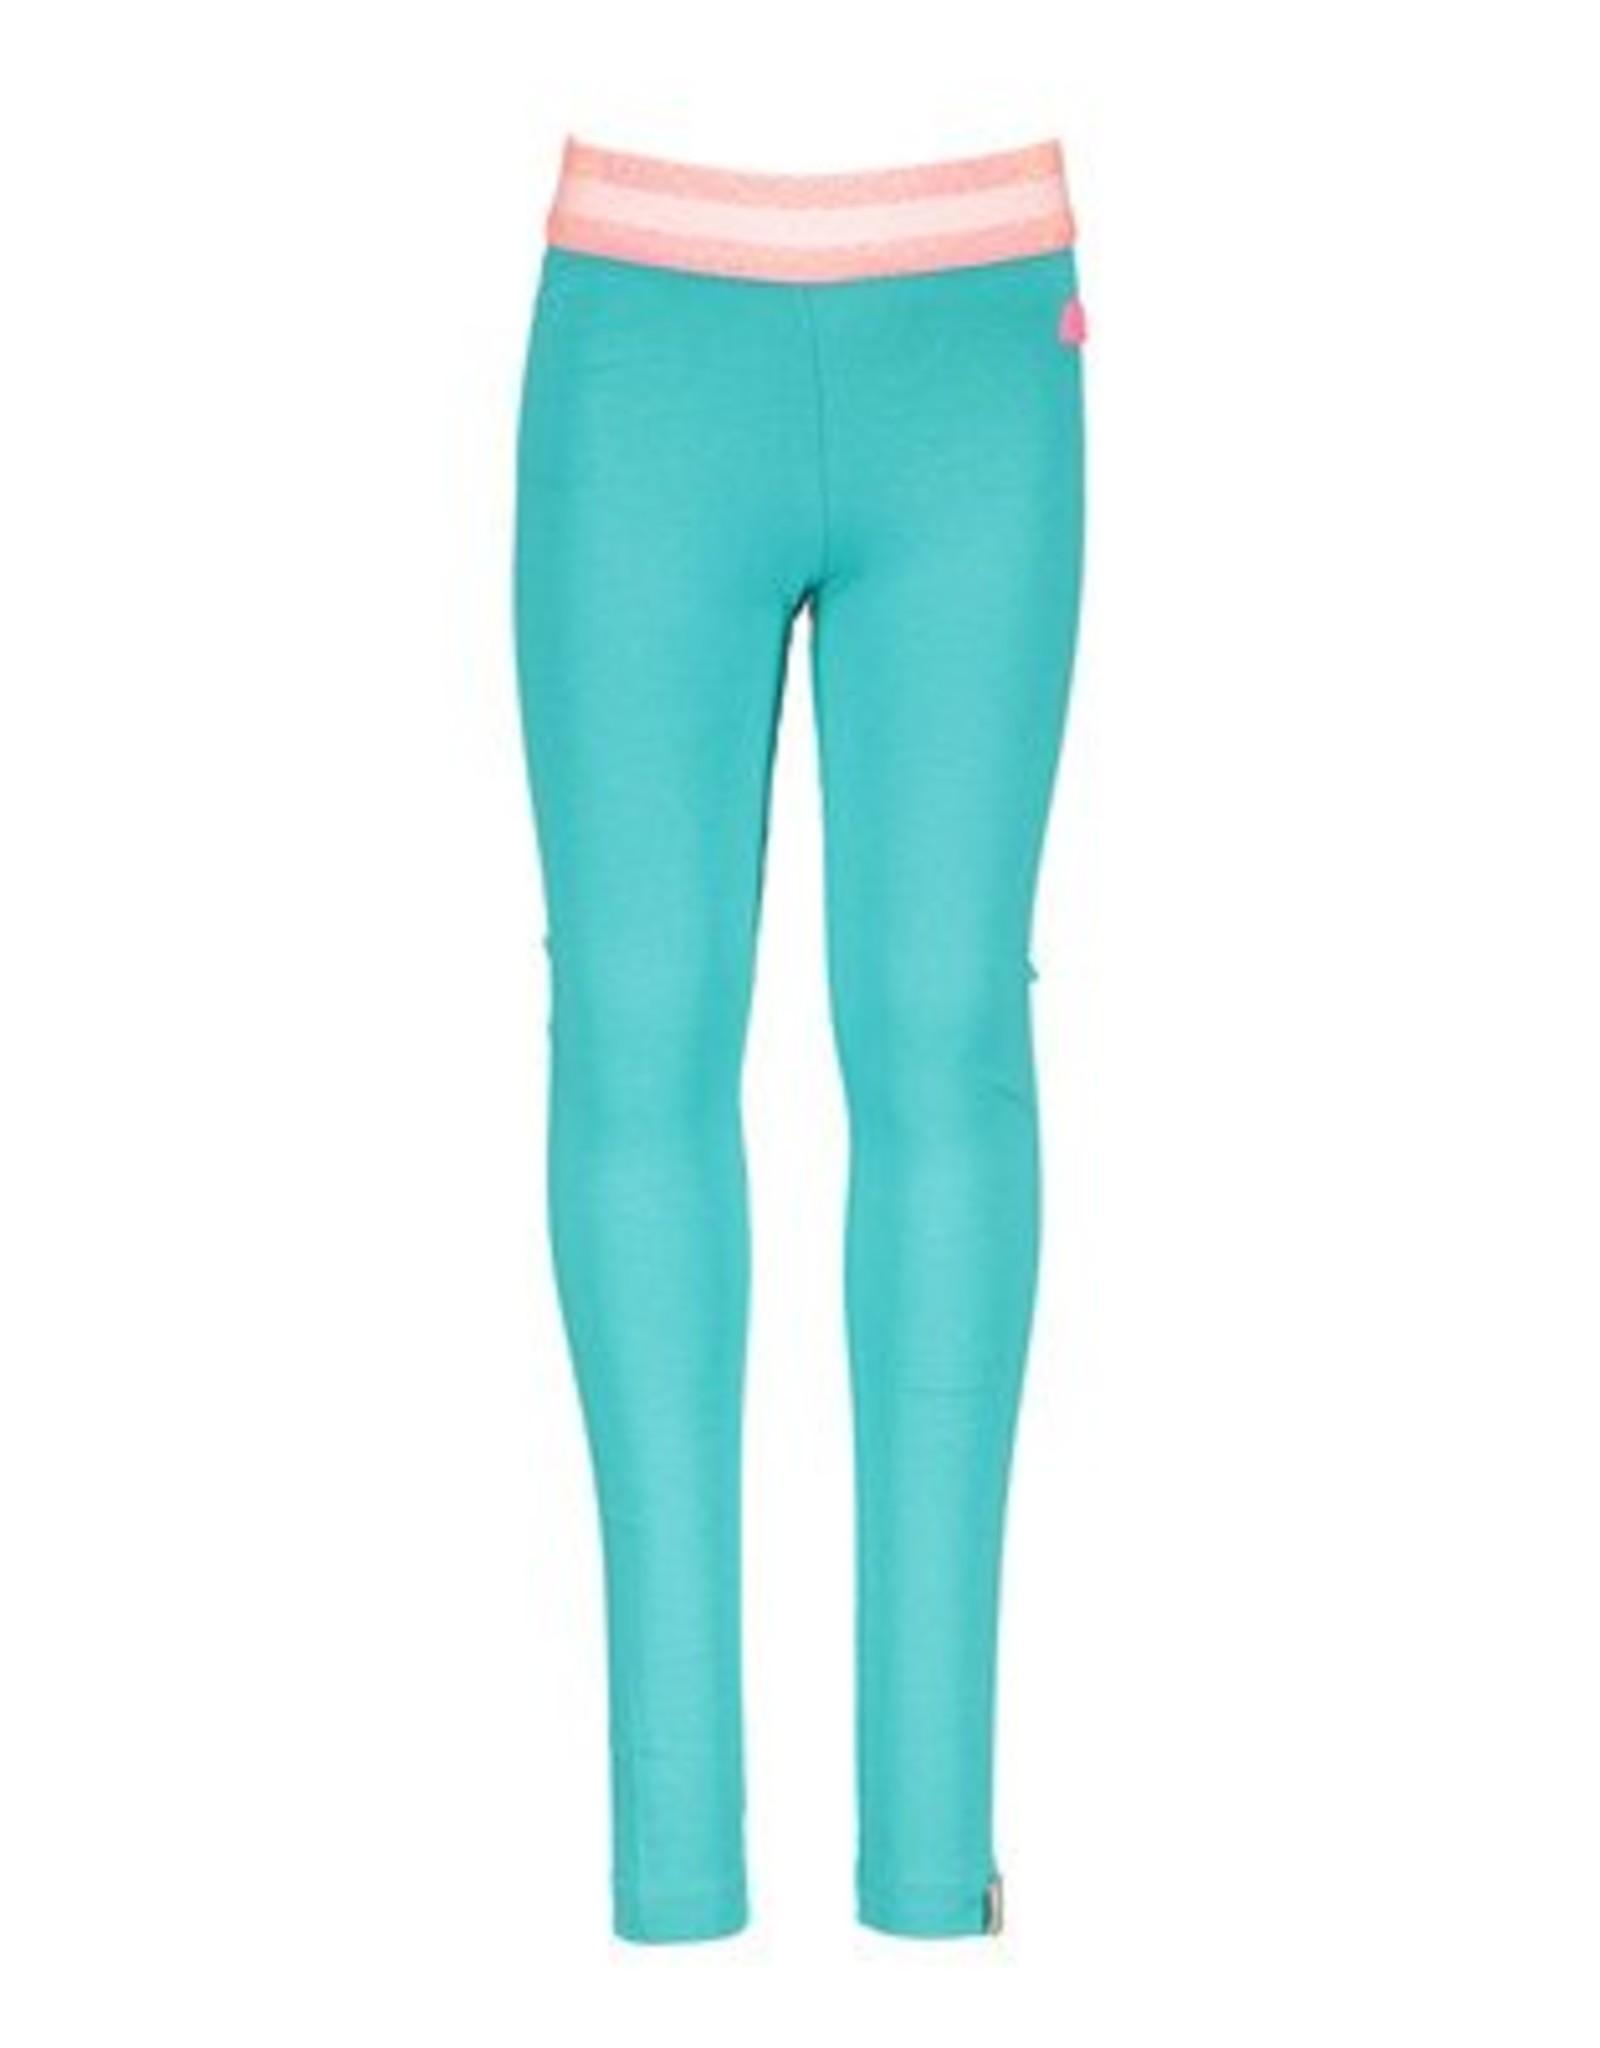 B-nosy B-nosy legging 142 turquoise